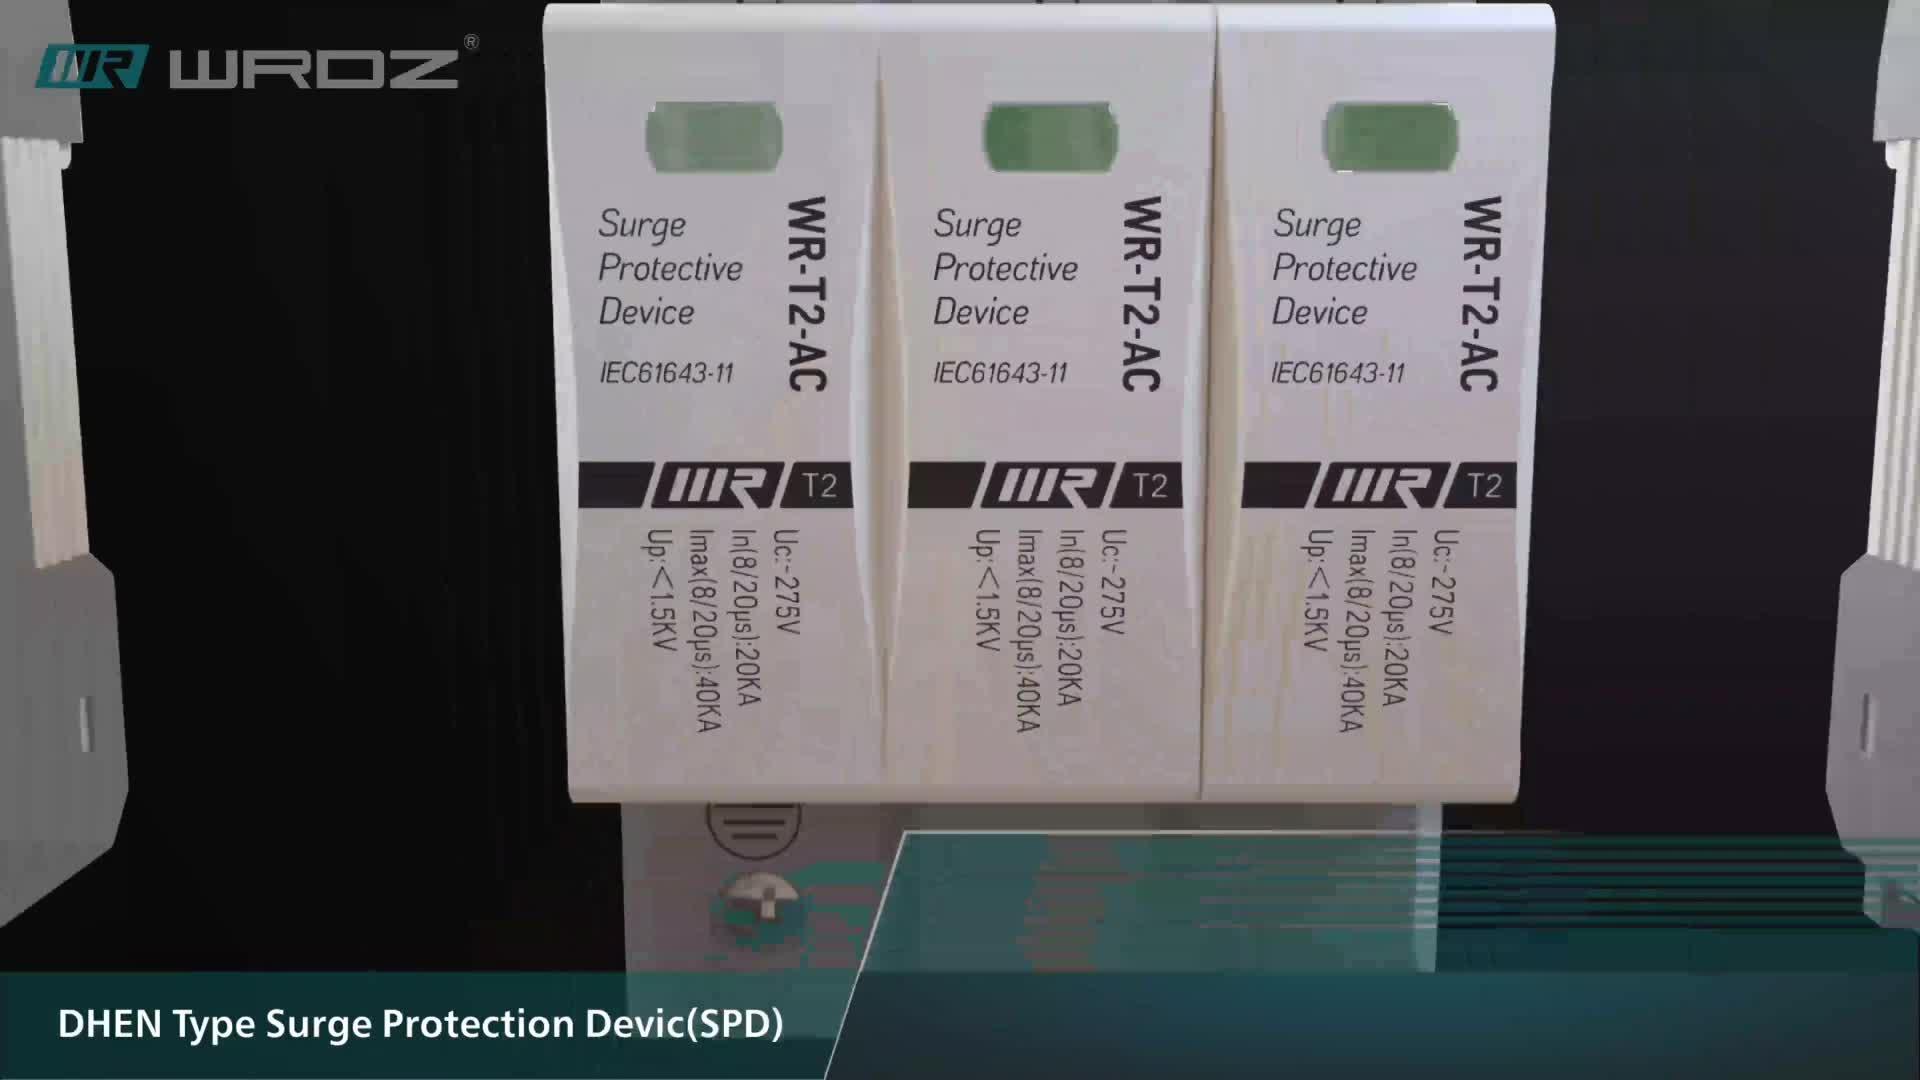 WRDZ Industrial Control 1 Pole T1 AC Lightning Surge Protective SPD Device